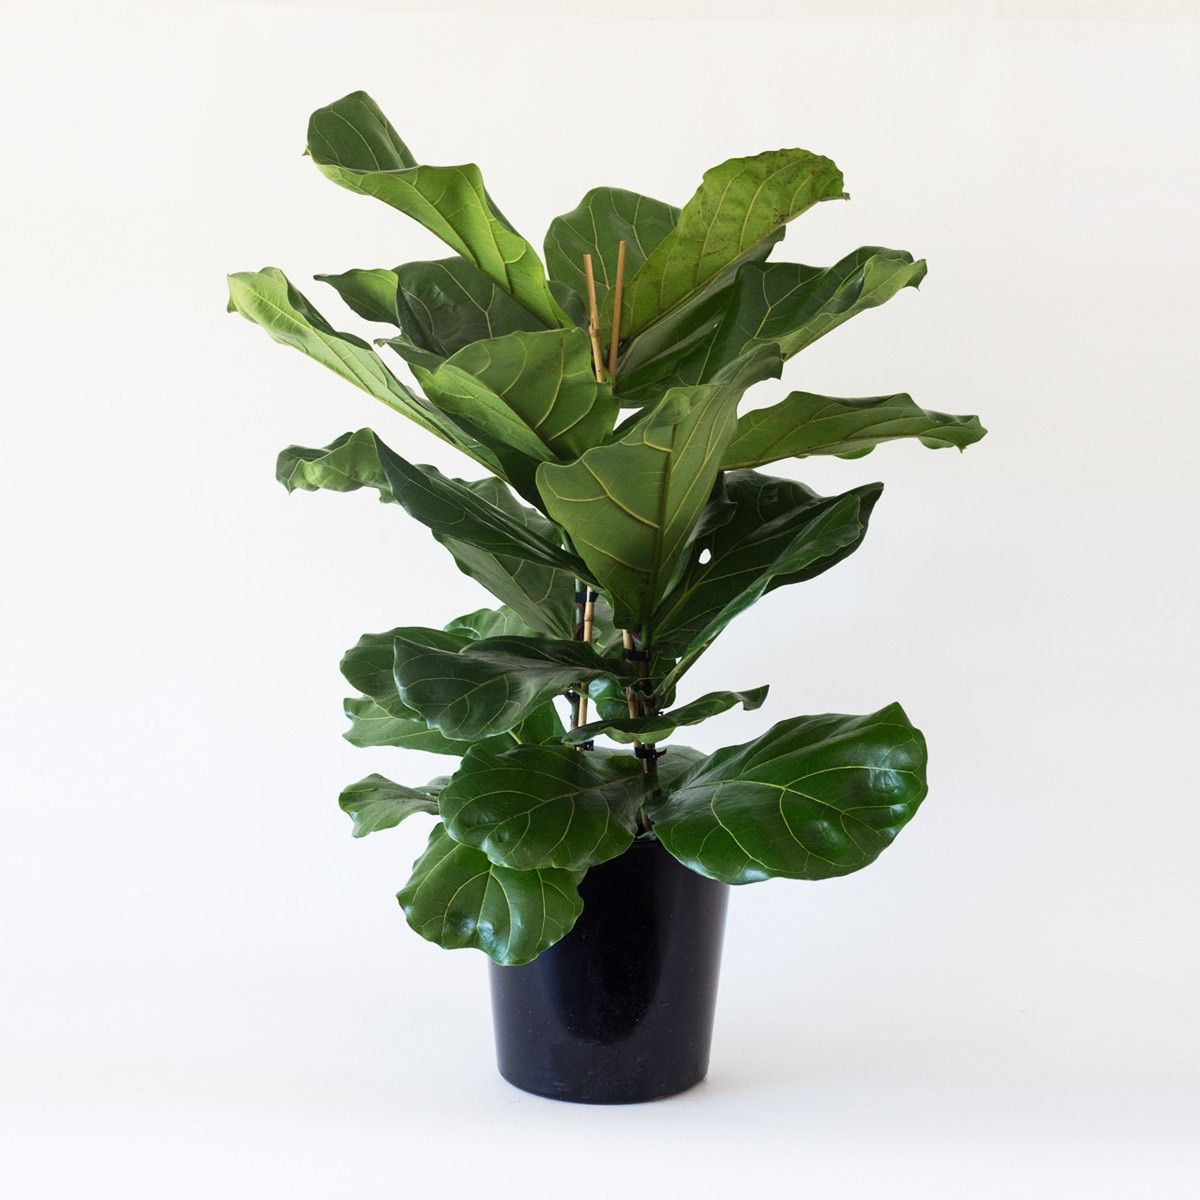 Indoor Natural Lighting For Plants